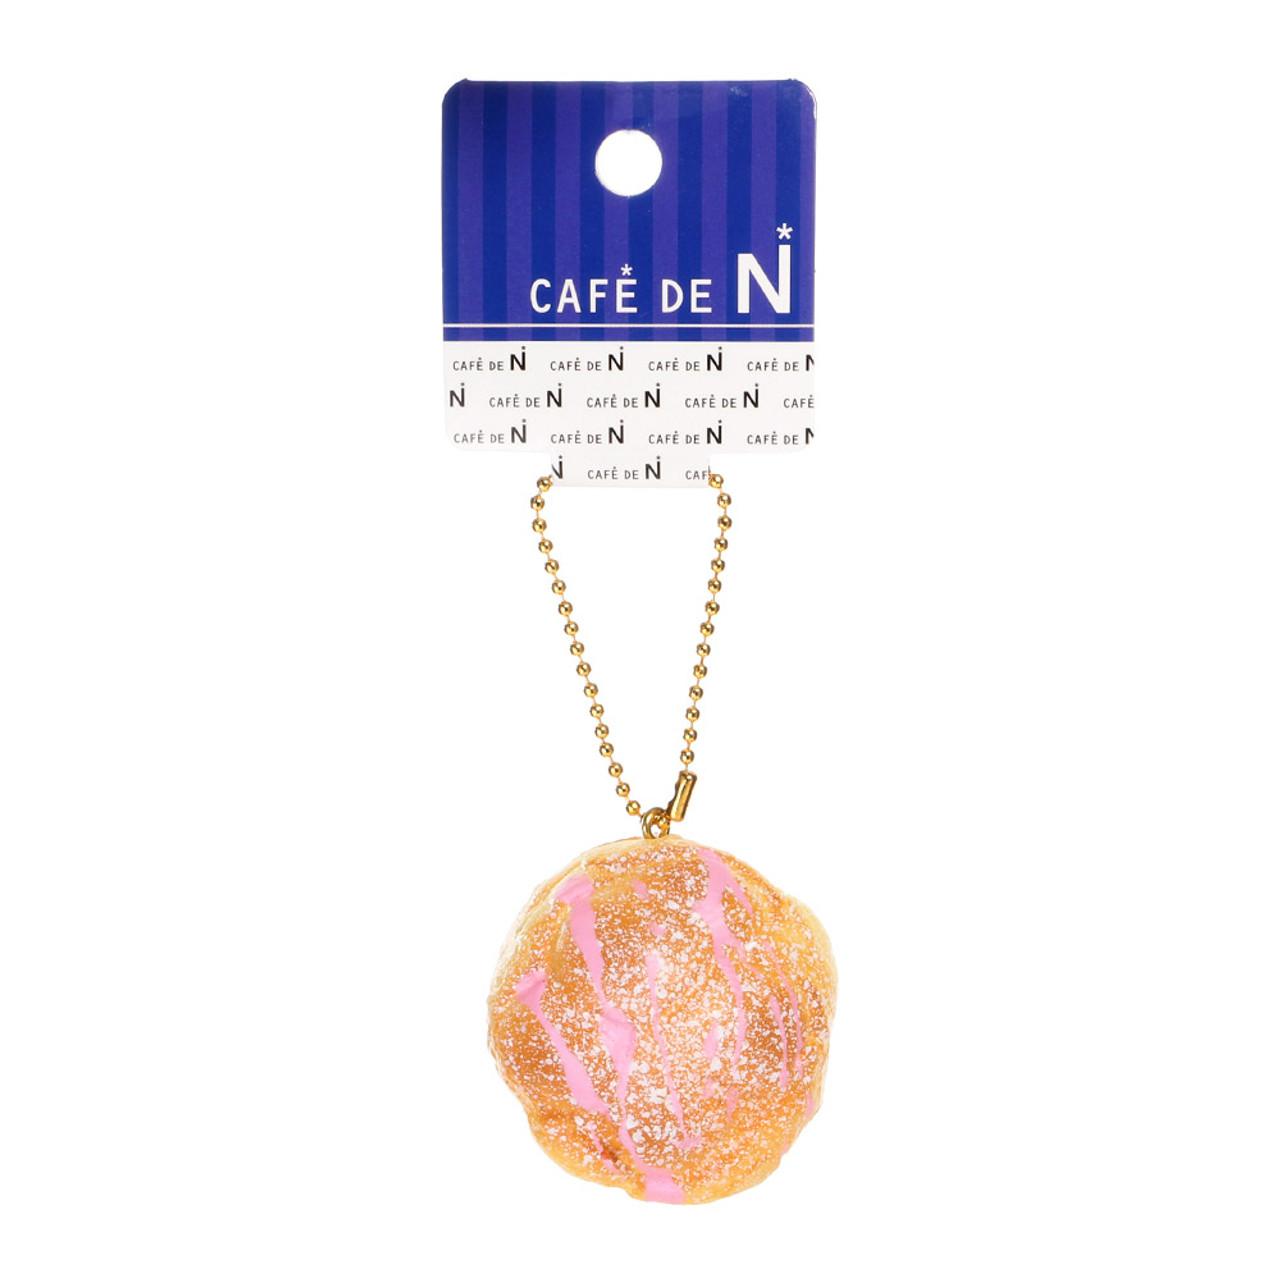 Café De N Strawberry Cream Puff Dessert Squishy Toy Cellphone Charms ( Tag View )